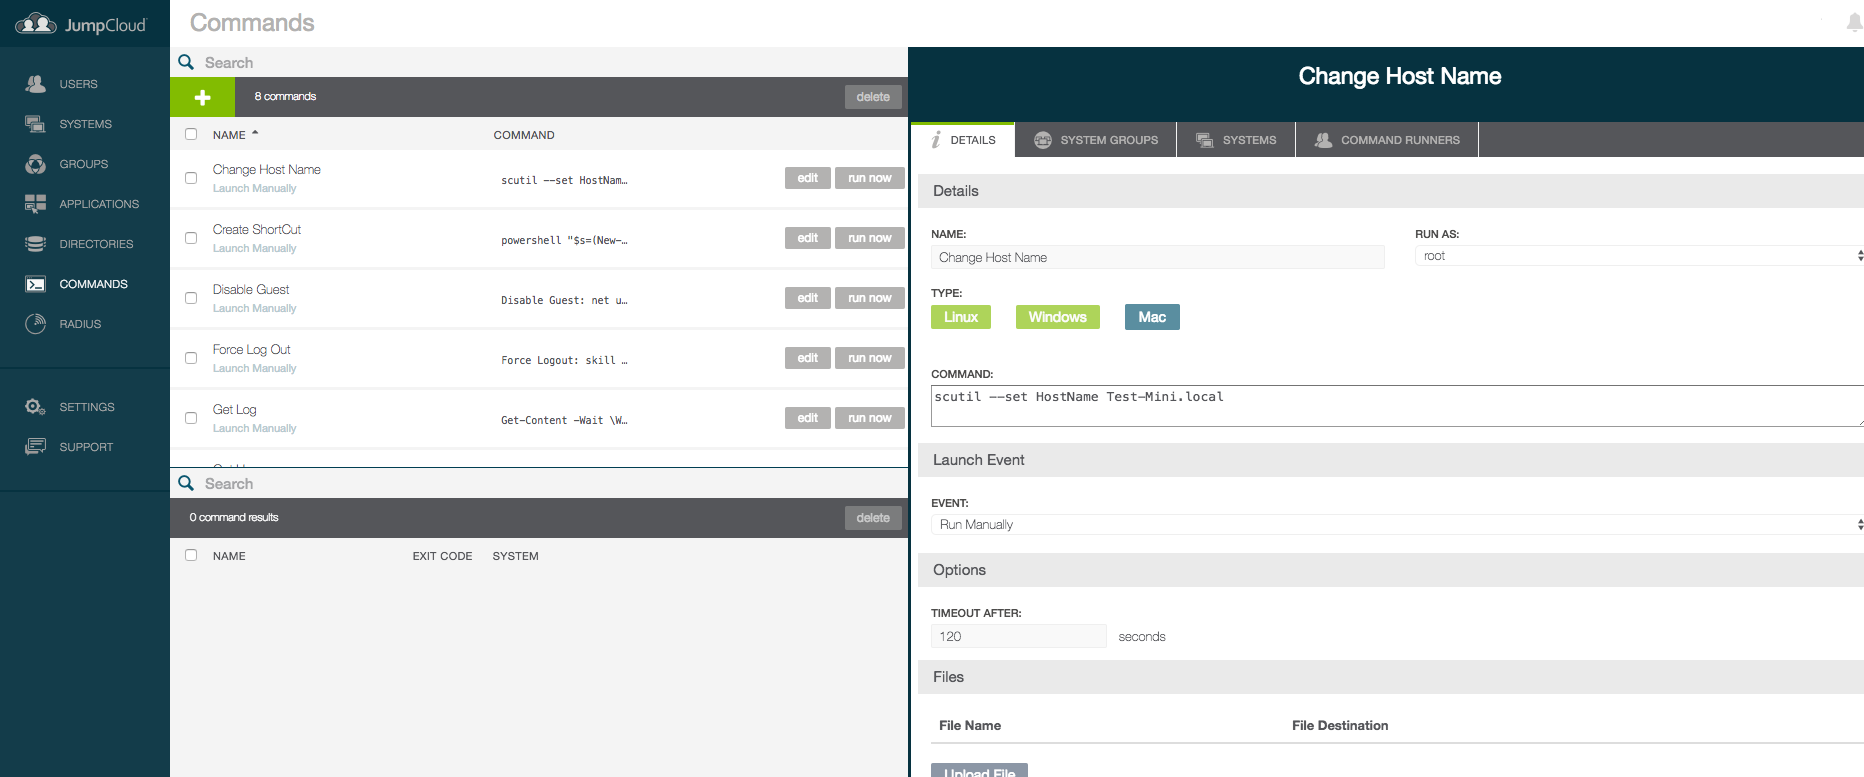 JumpCloud Directory-as-a-Service Demo - JumpCloud - Screenshot 1